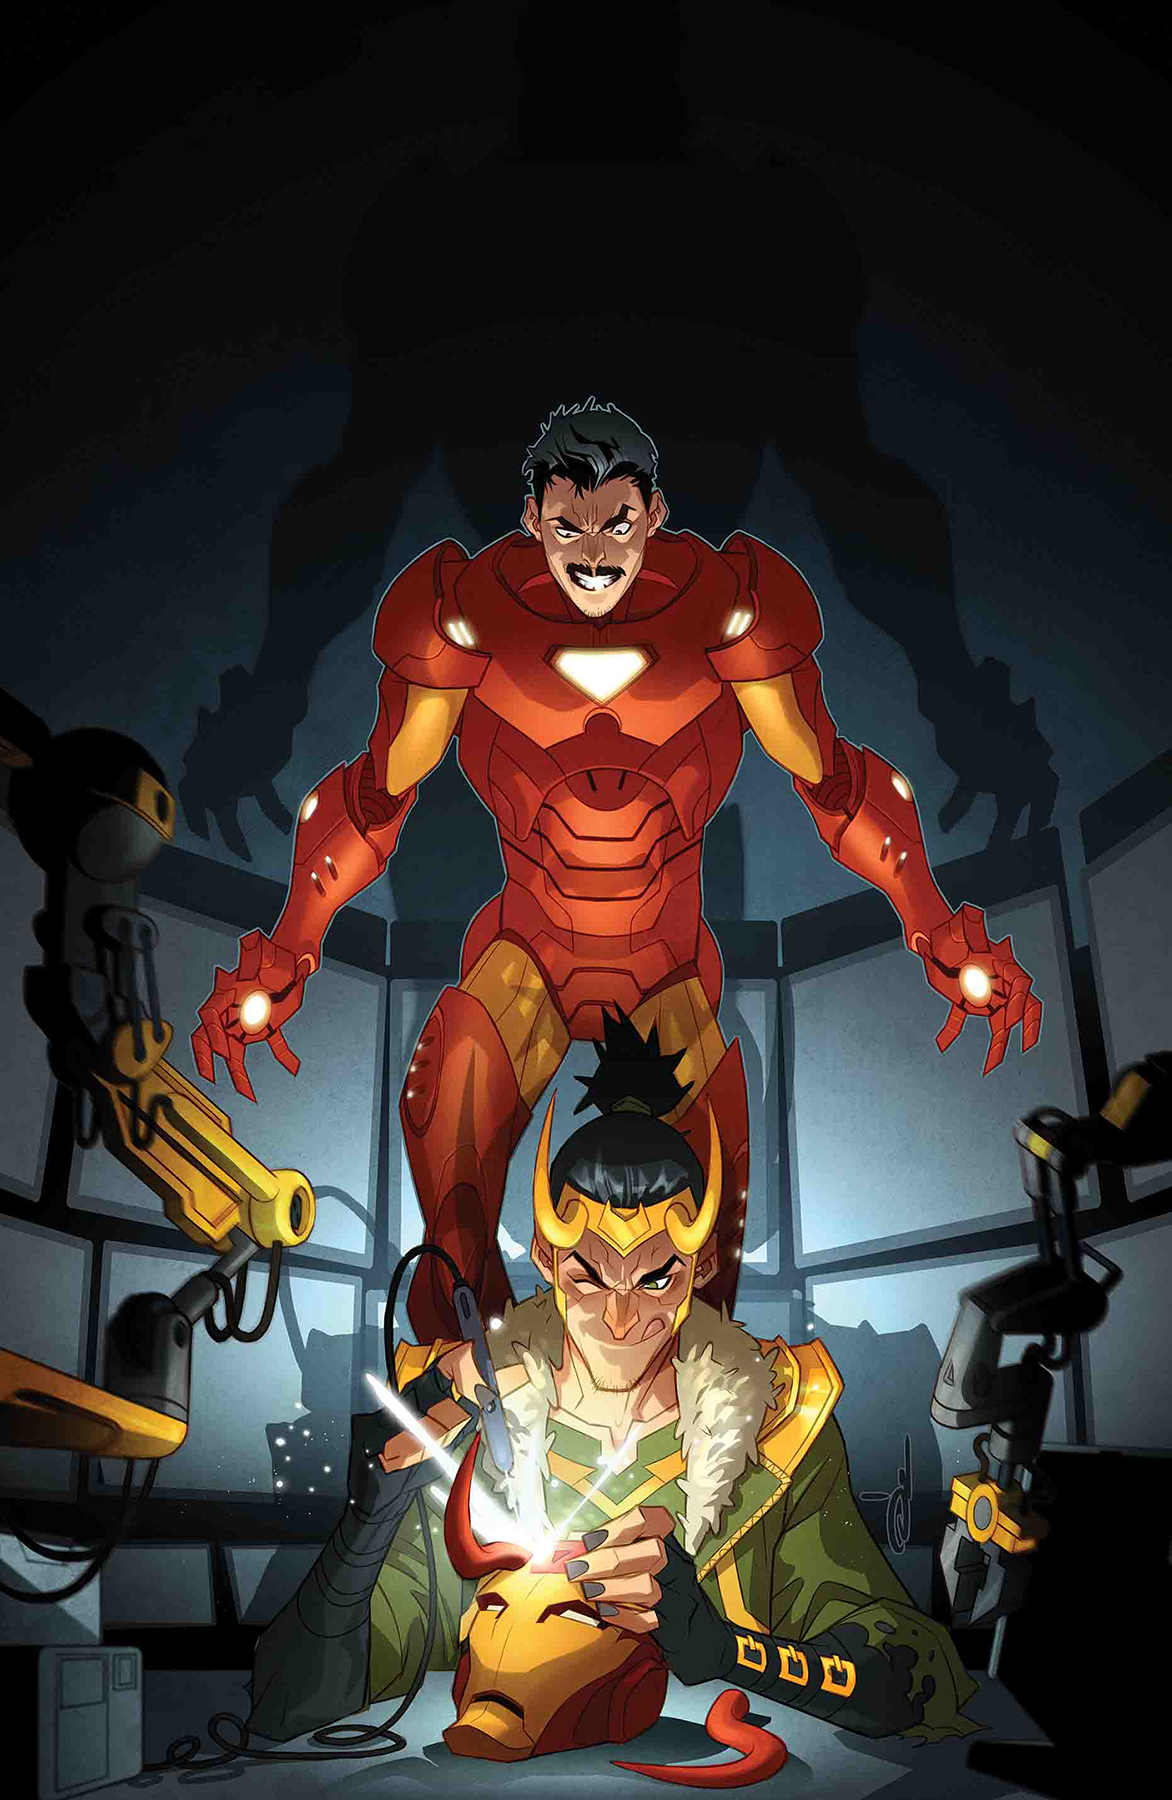 Loki #2 (STL126226) - Comics » Marvel Comics » Marvel Back